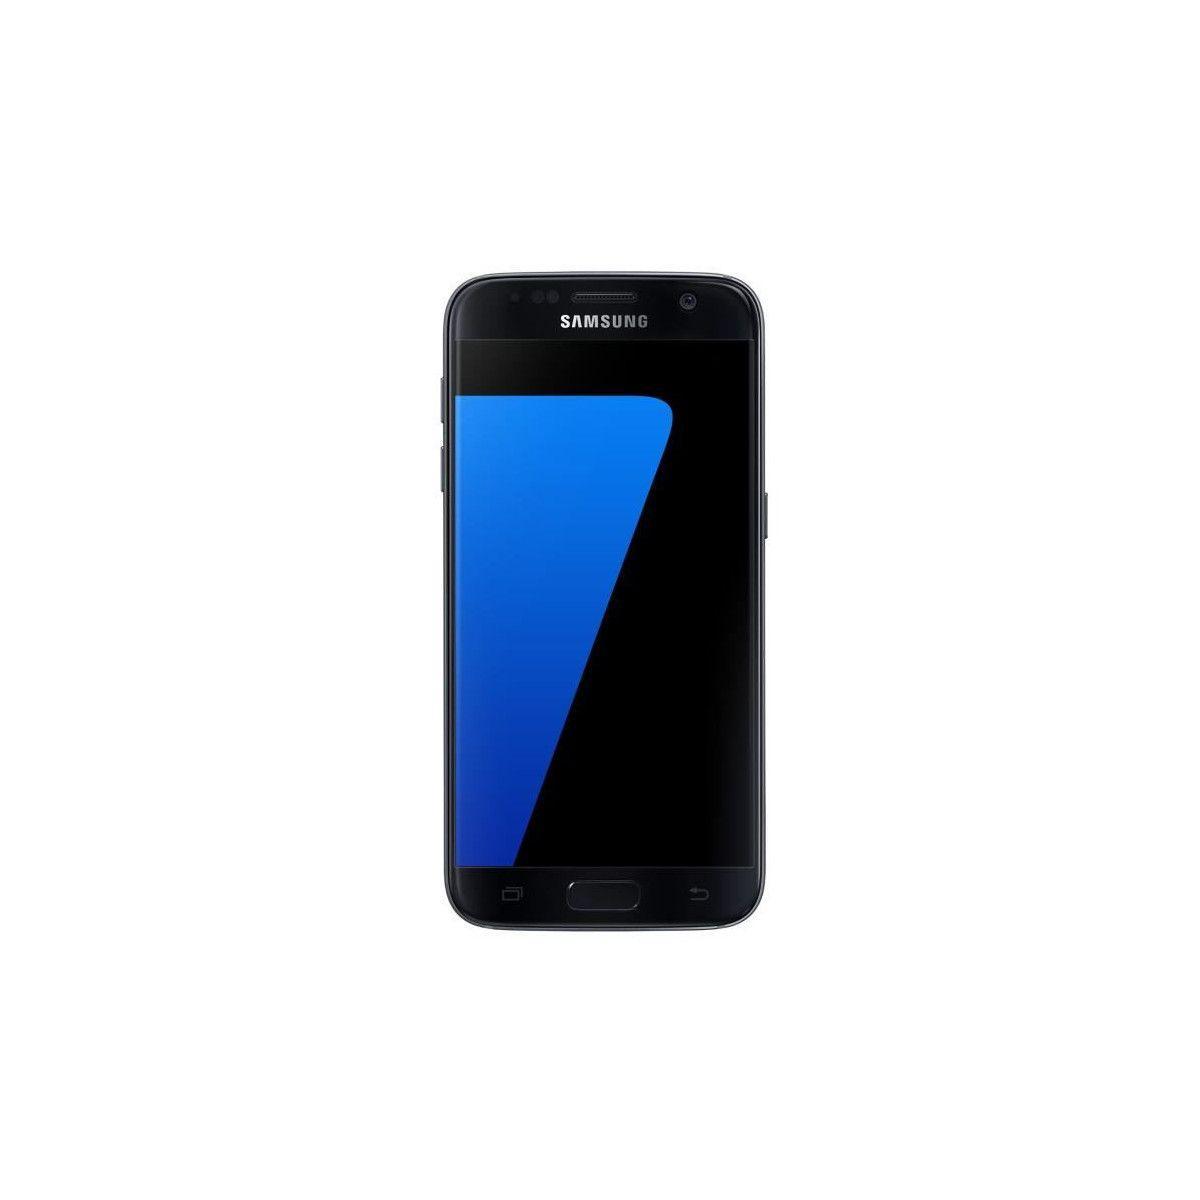 SAMSUNG Galaxy S7 Noir - 32Go